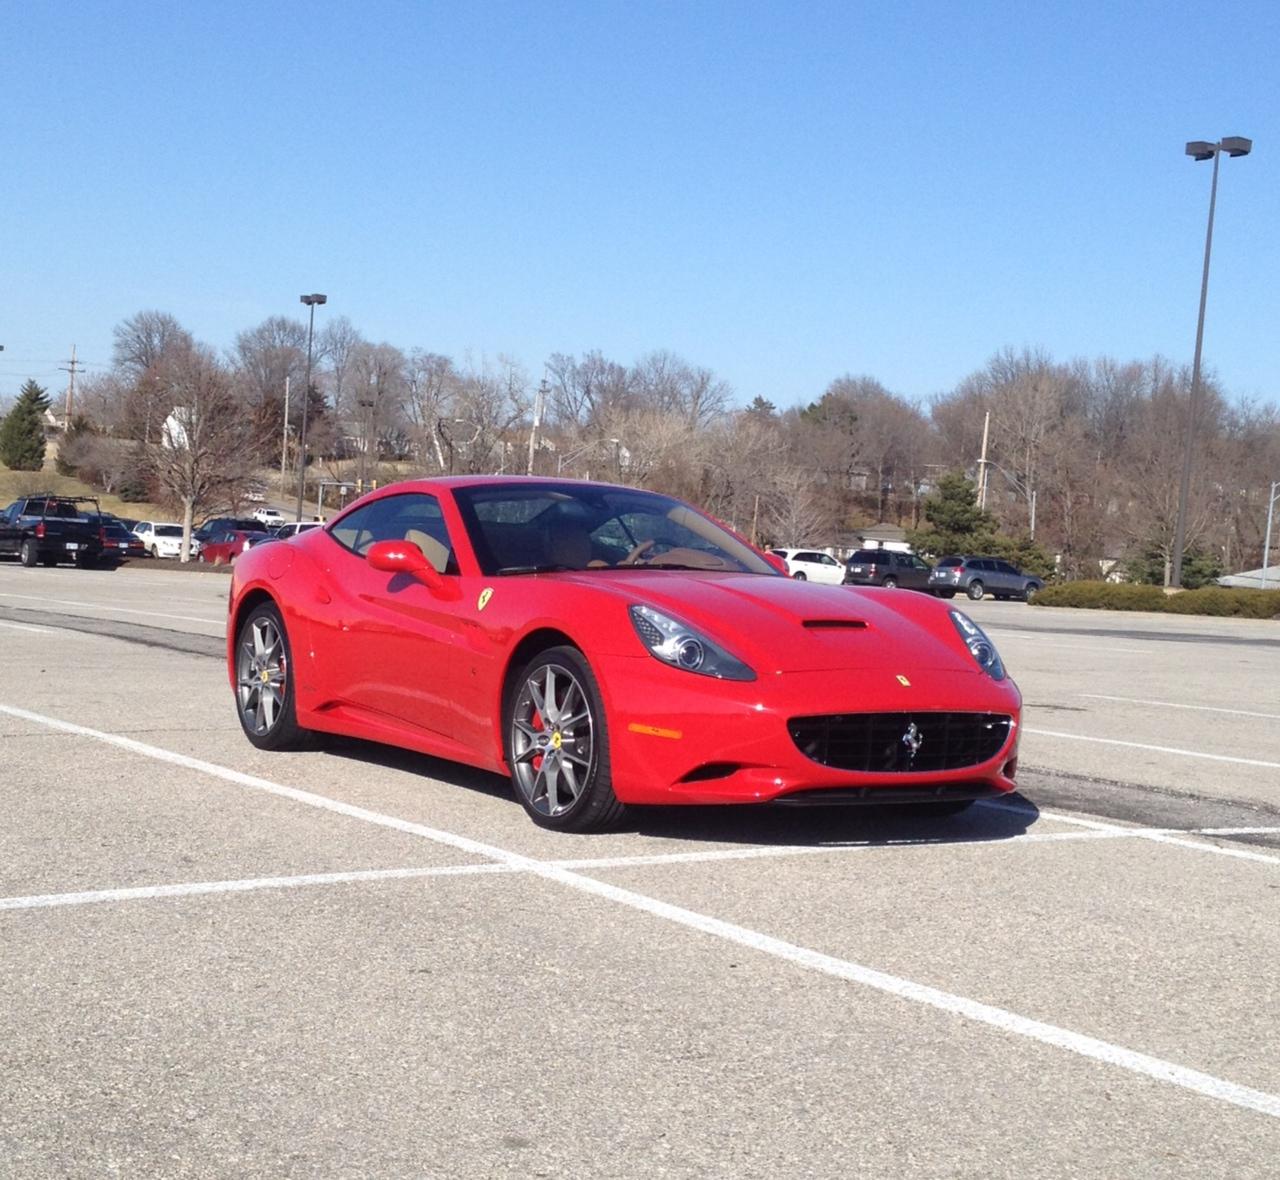 Motoring Through Life: April 2012